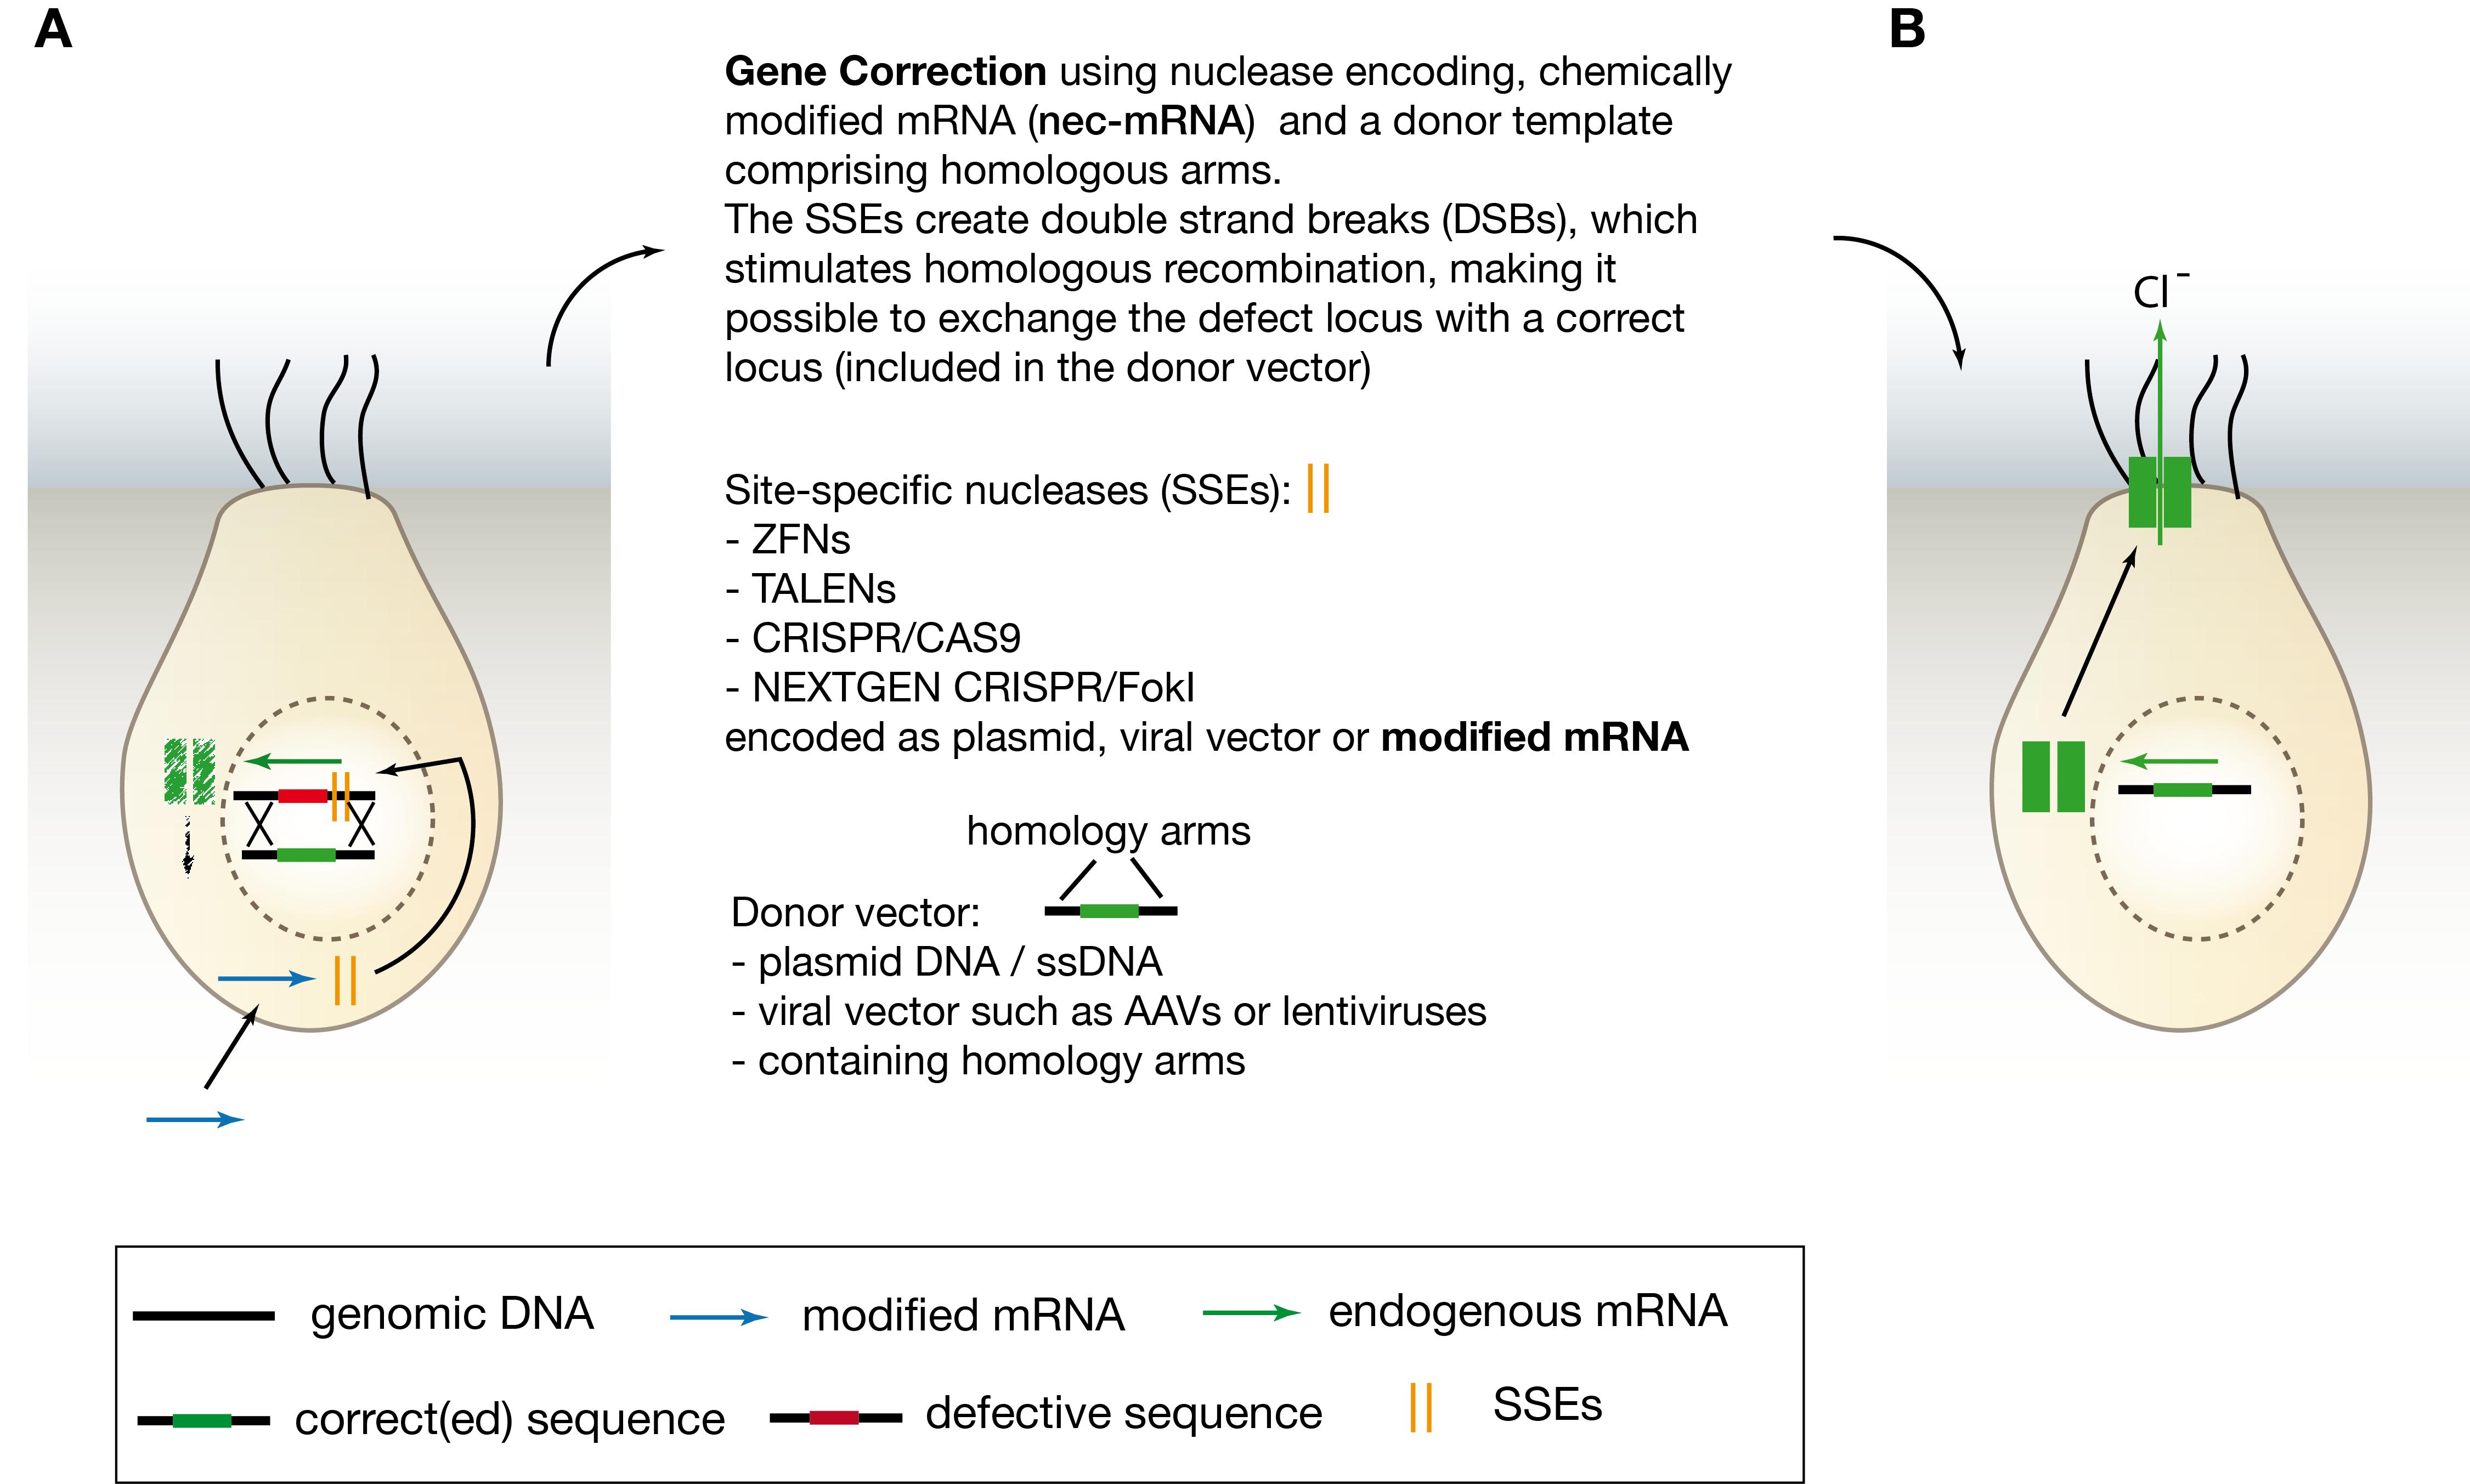 In vivo Gene Correction of Cystic Fibrosis | IntechOpen